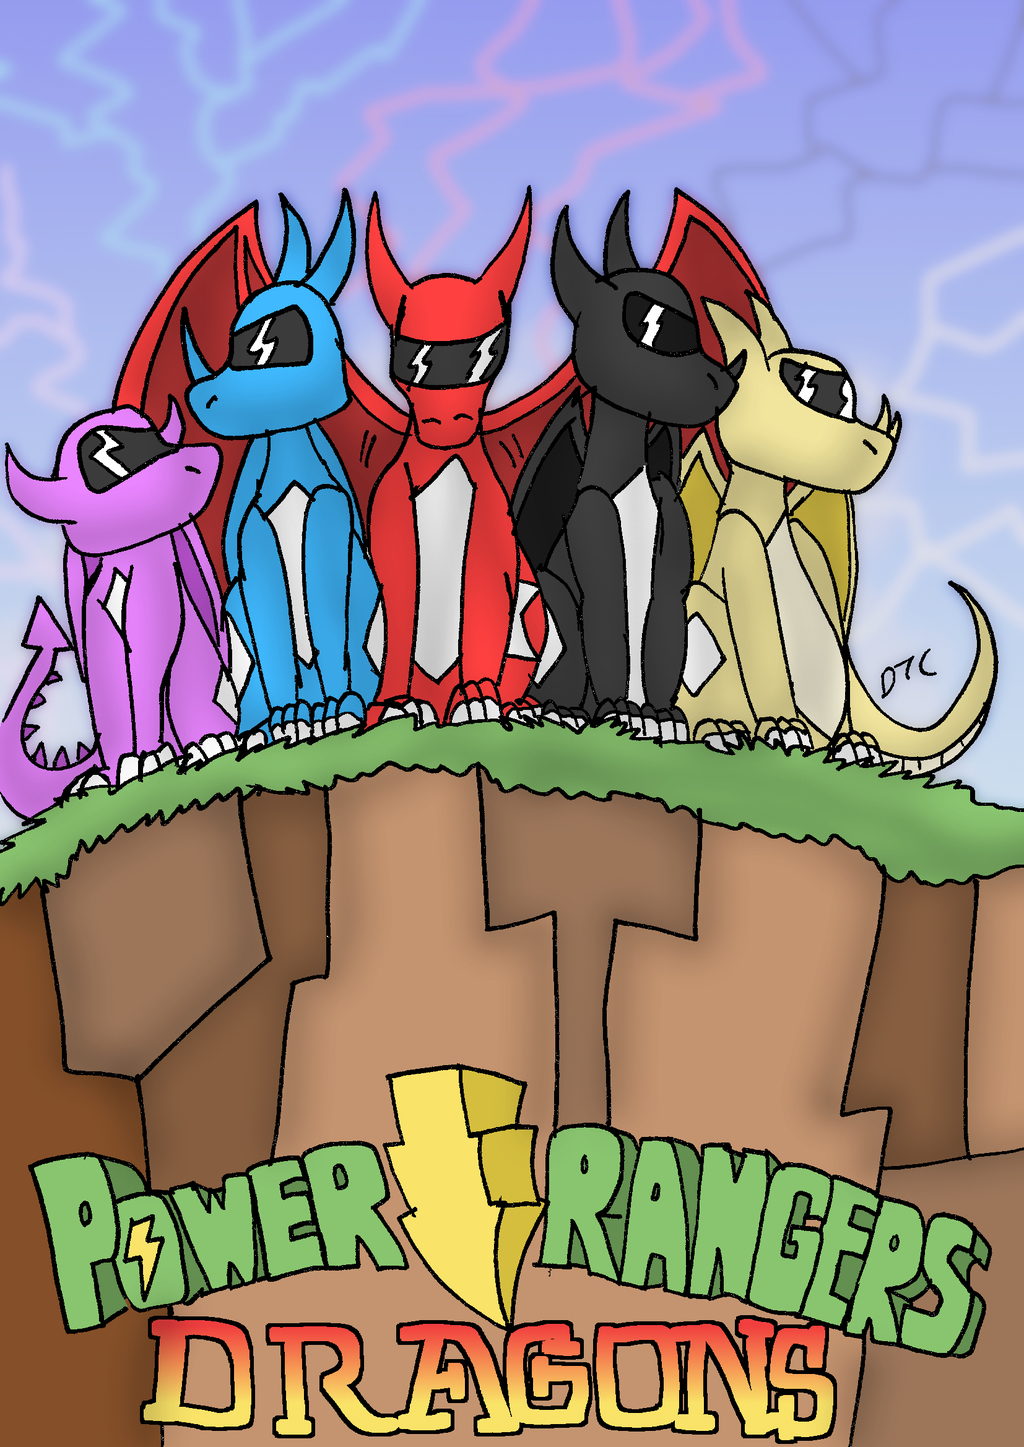 Most recent image: go go dragon rangers